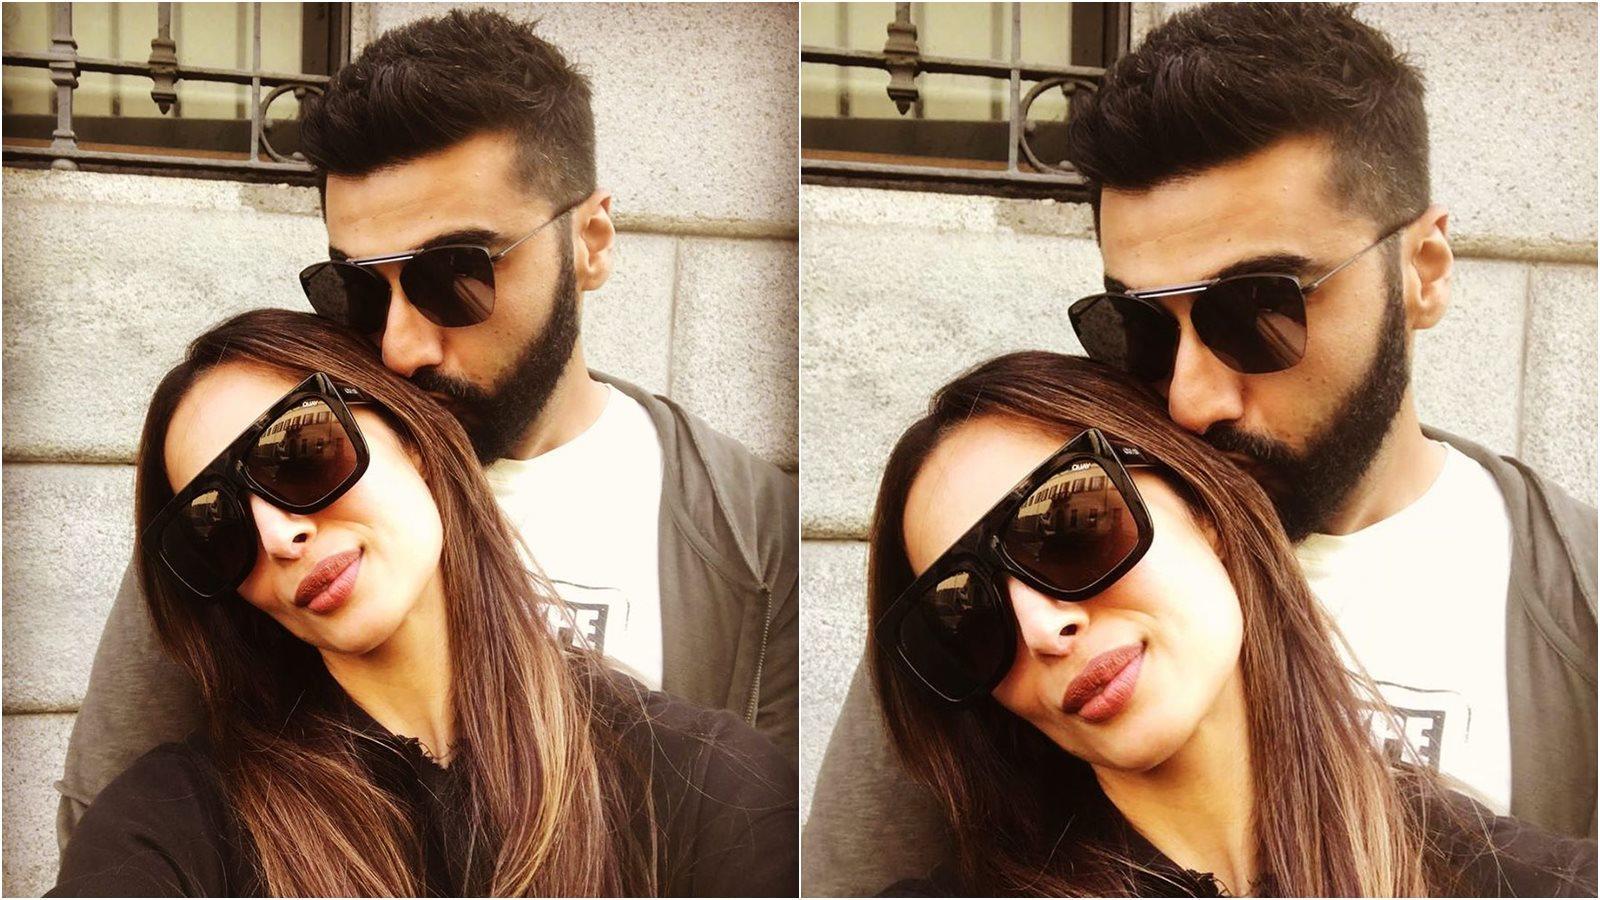 Malaika Arora seals her birthday with a kiss from beau Arjun Kapoor